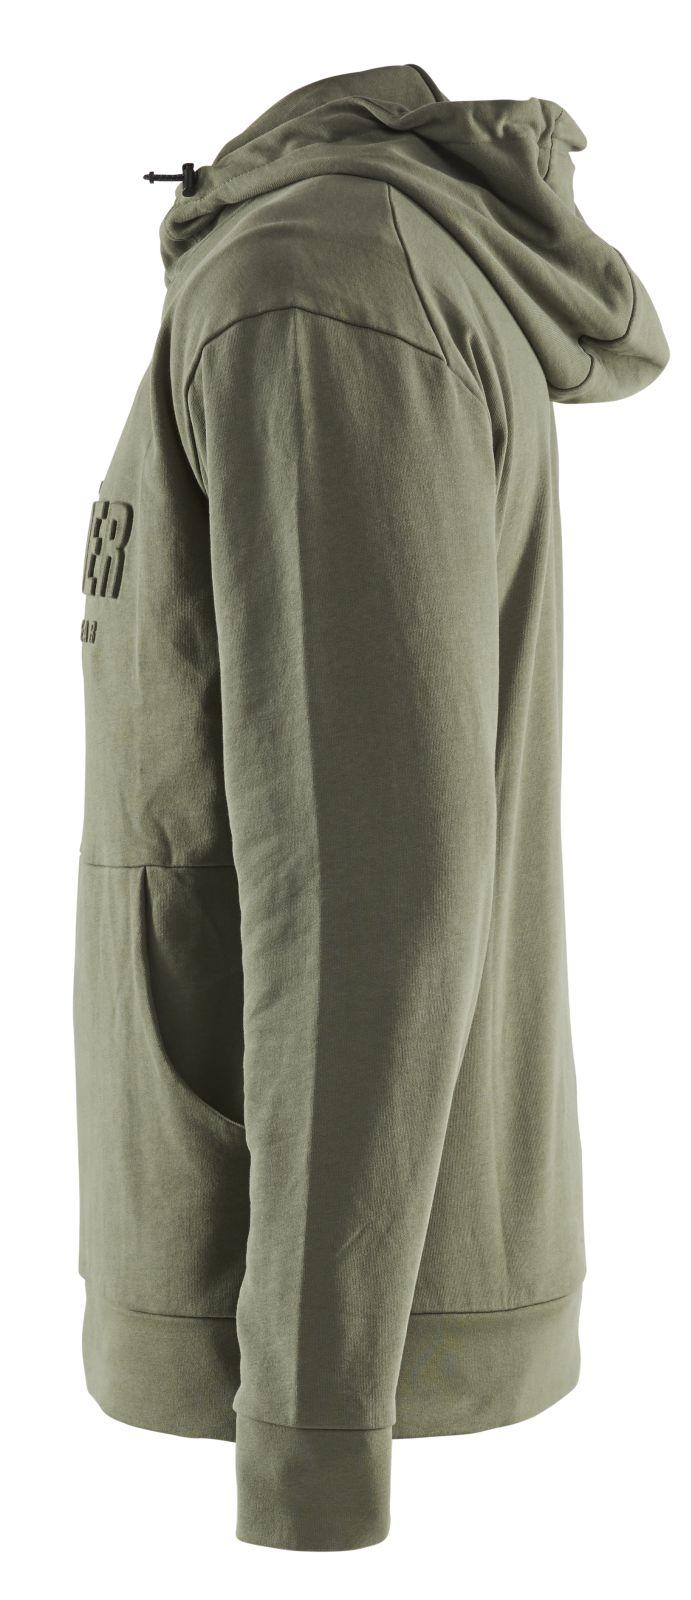 Blaklader sweatershirts 35301158 herfstgroen(4109)